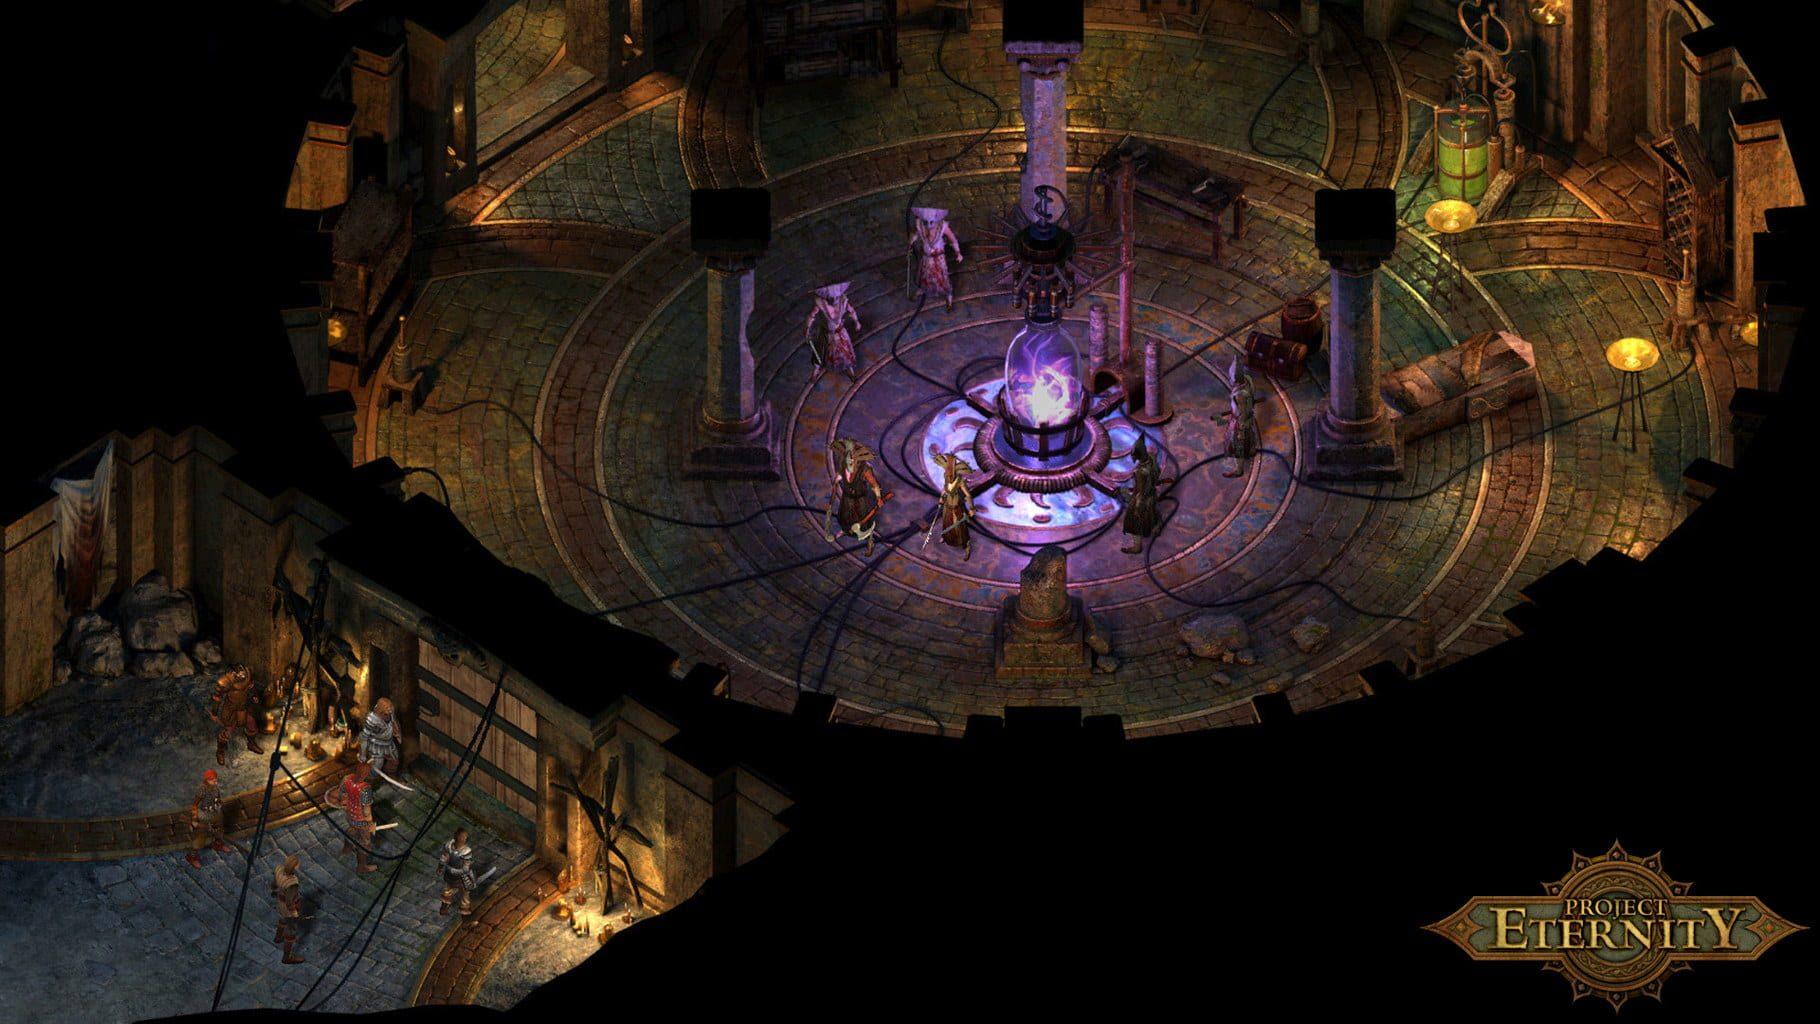 Pillars of Eternity – Recensione | Splendido CRPG moderno, in mobilità